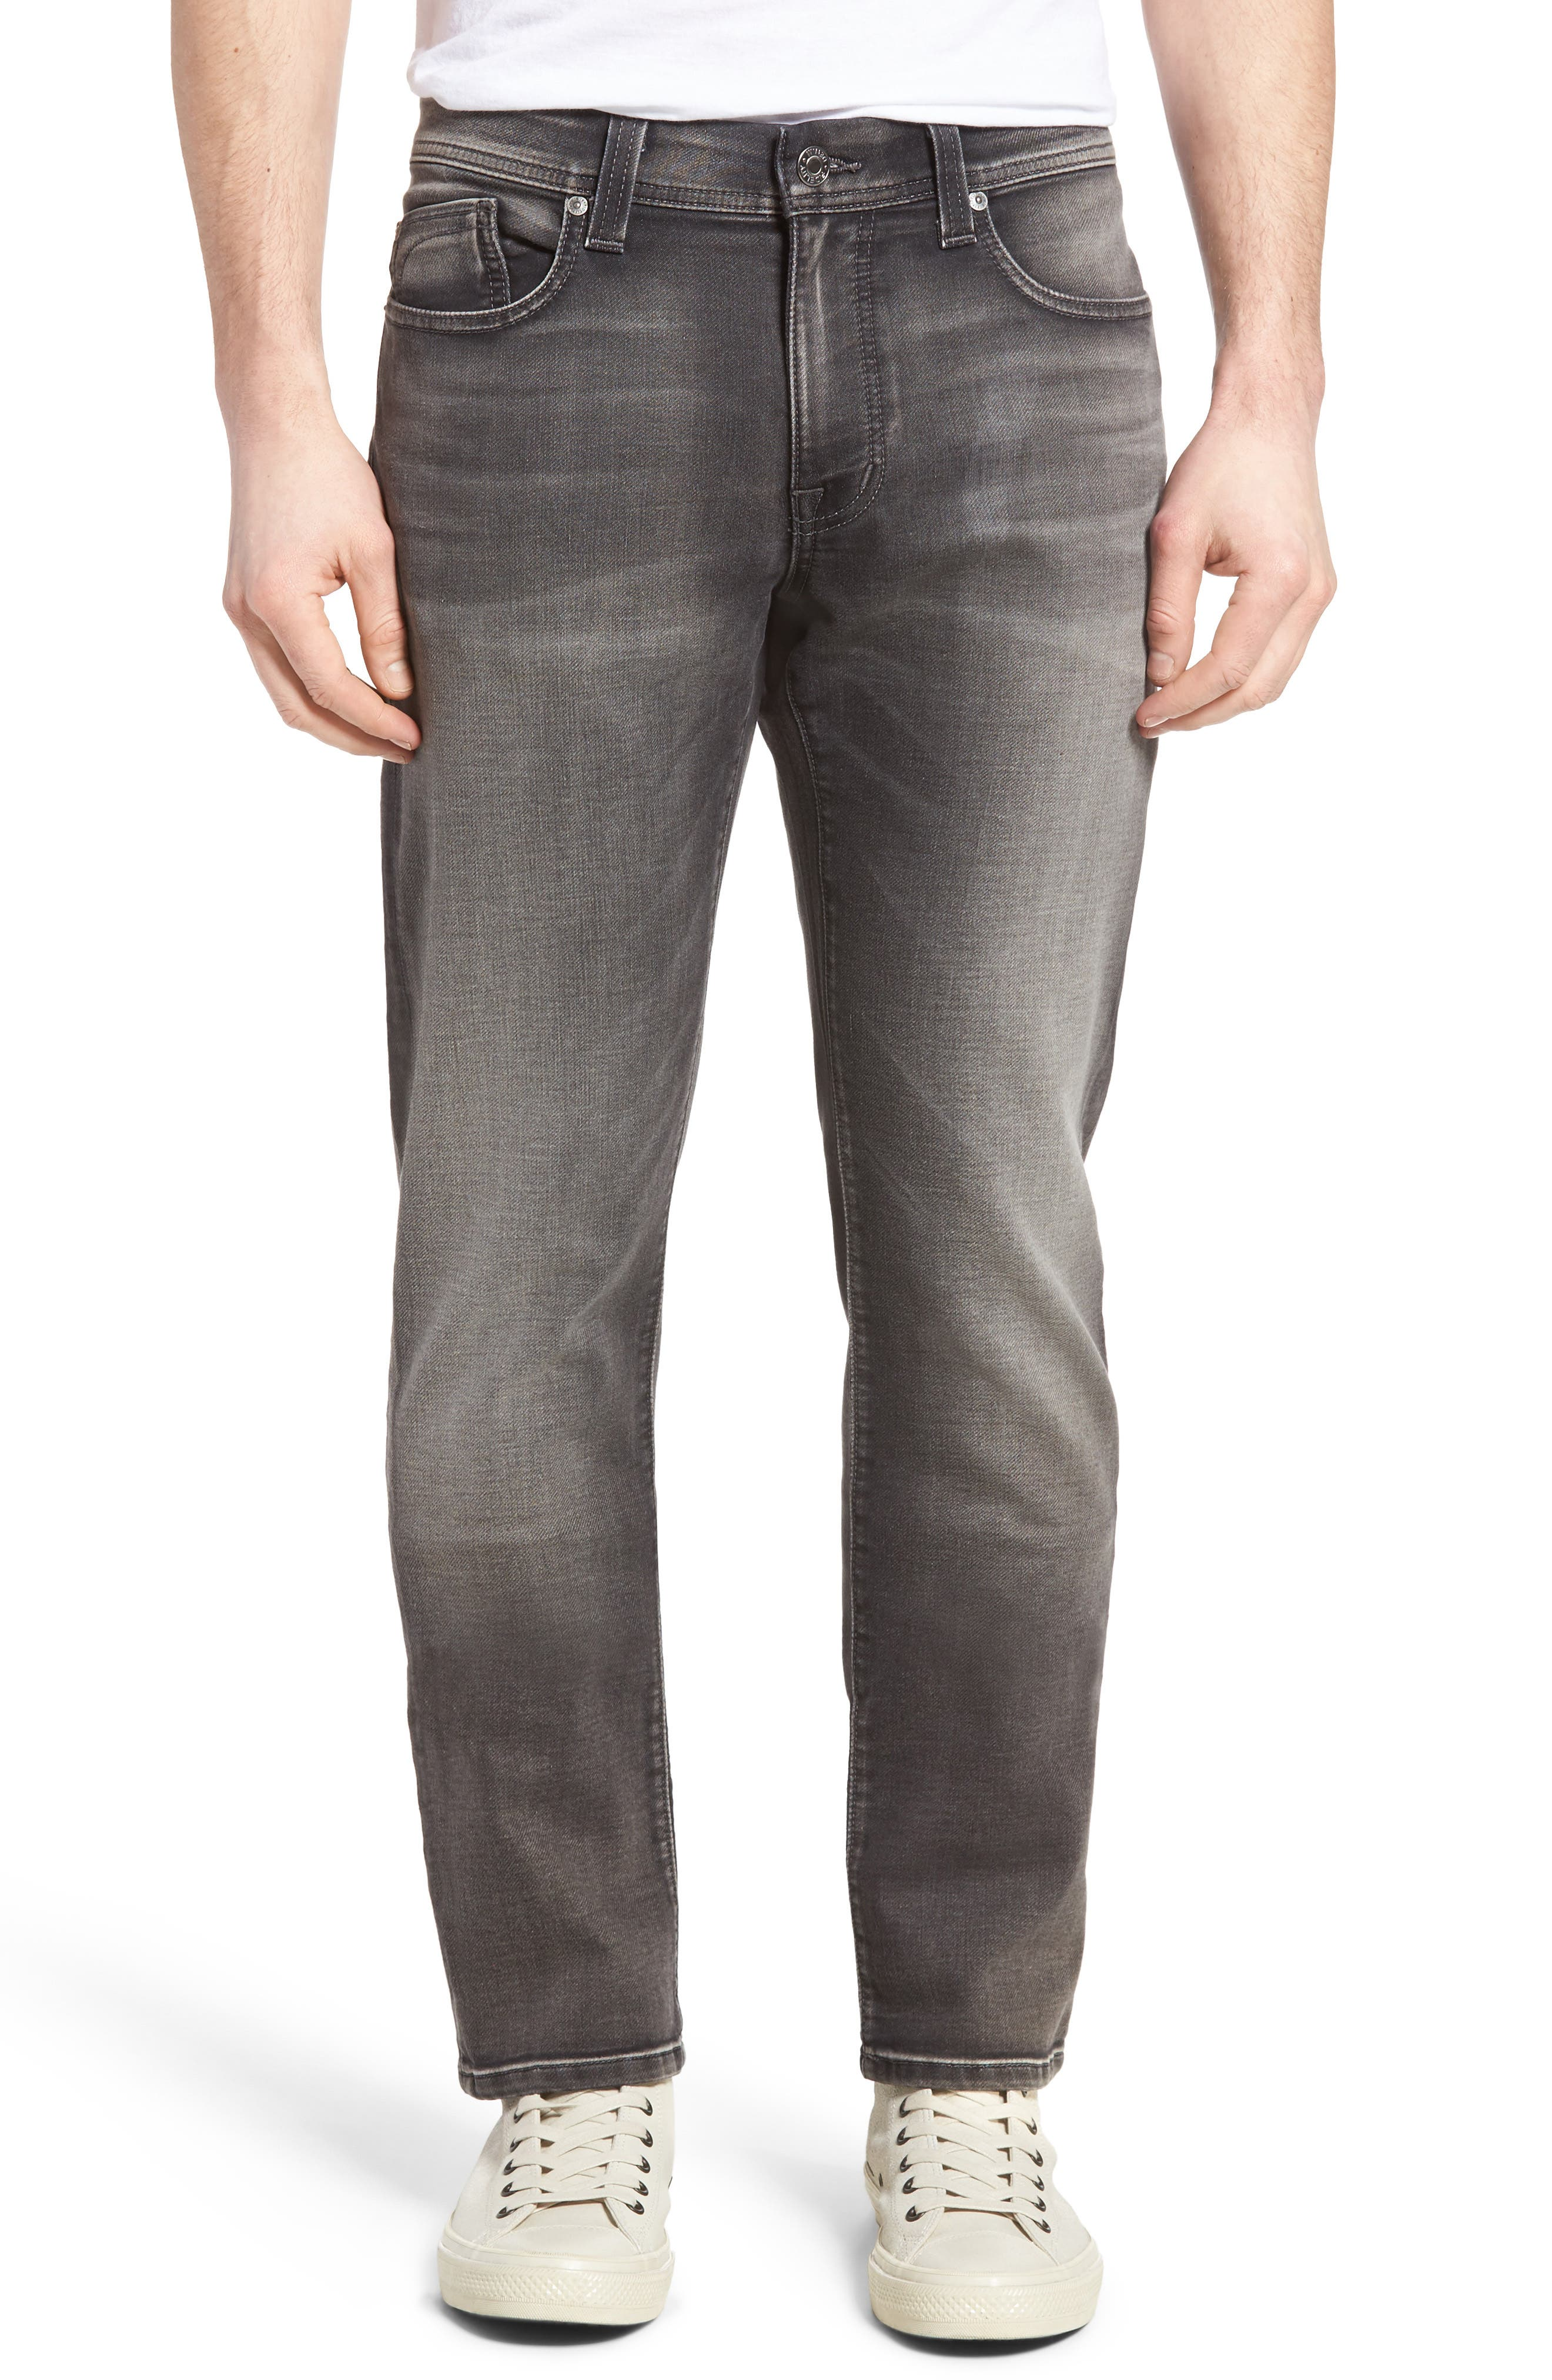 Fidelity Jimmy Slim Fit Jeans,                         Main,                         color, 001